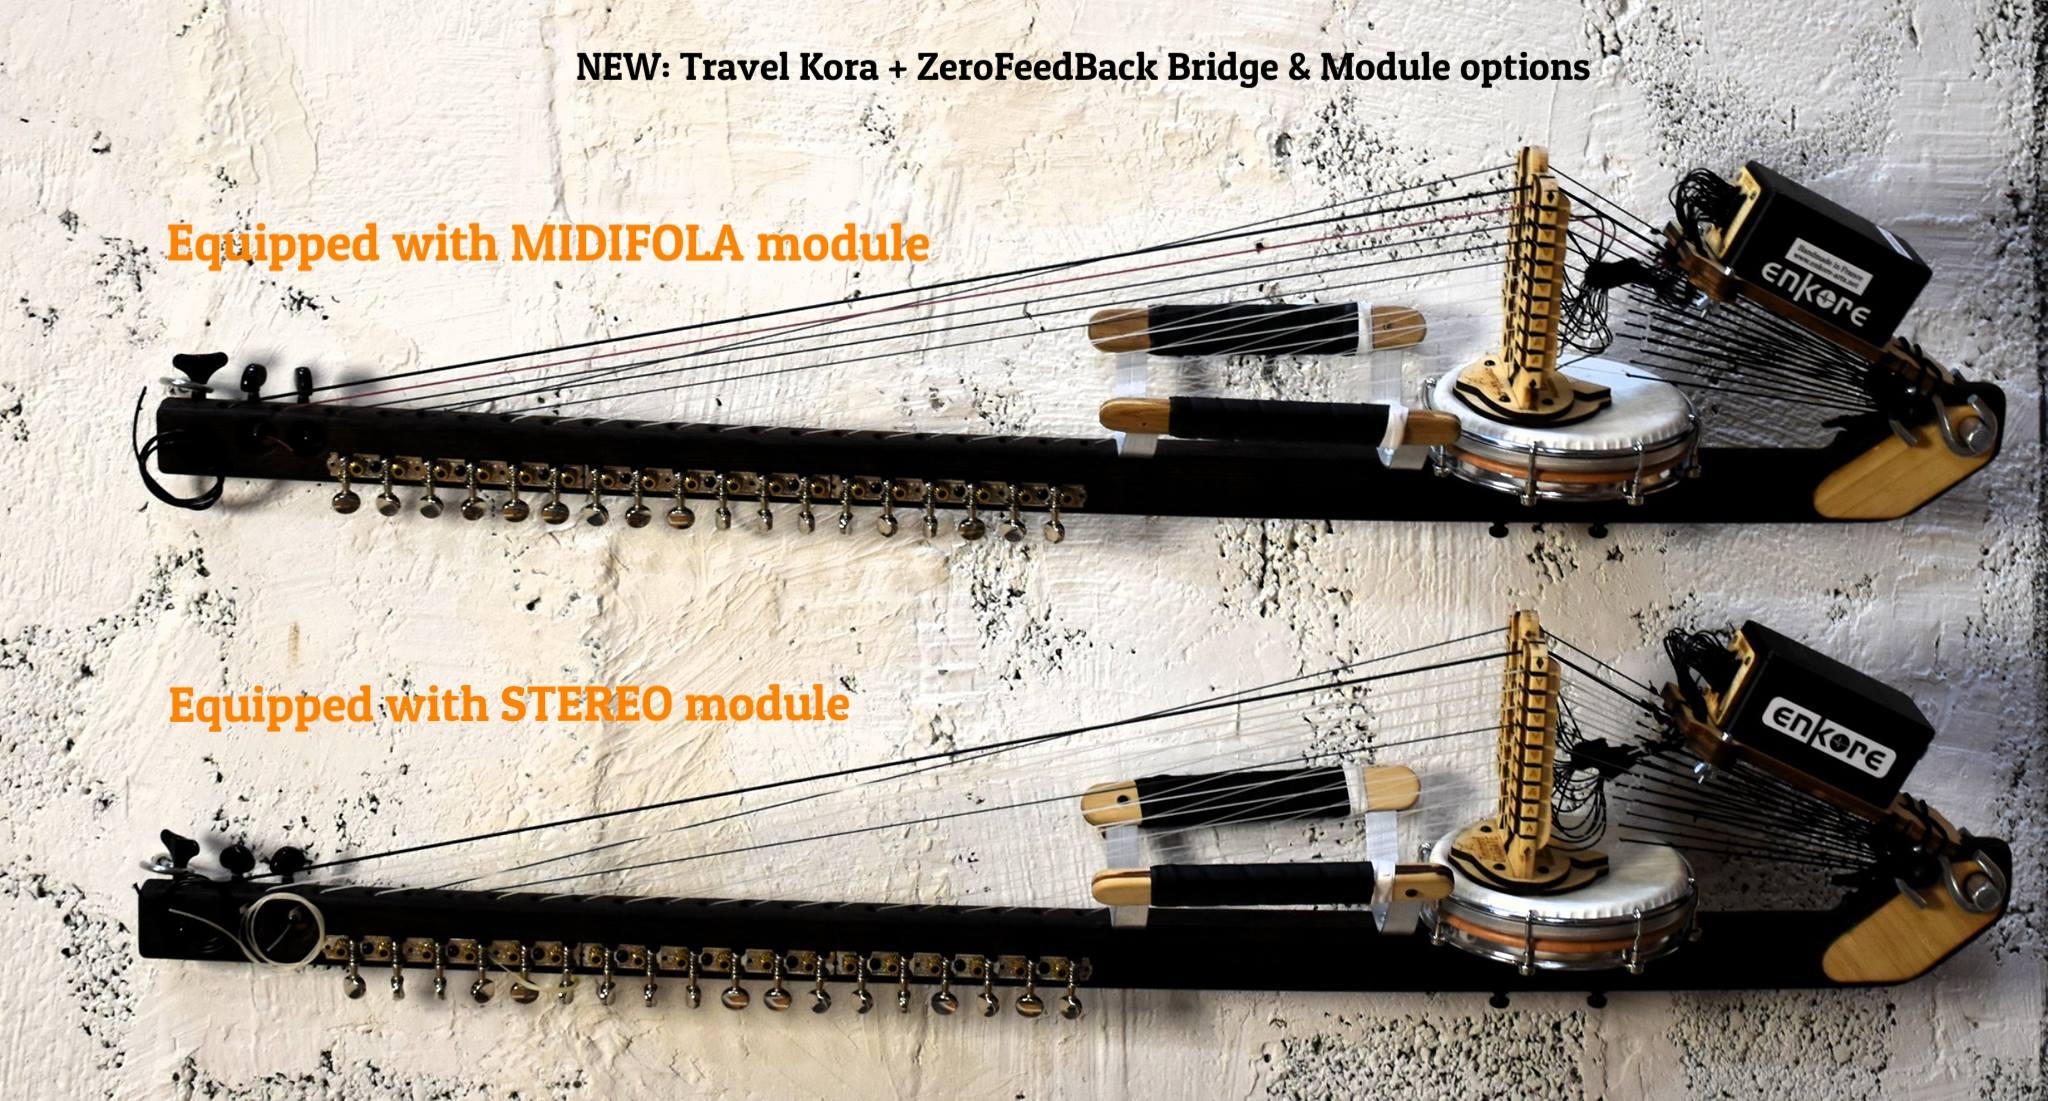 Travel Kora Pro & Modules